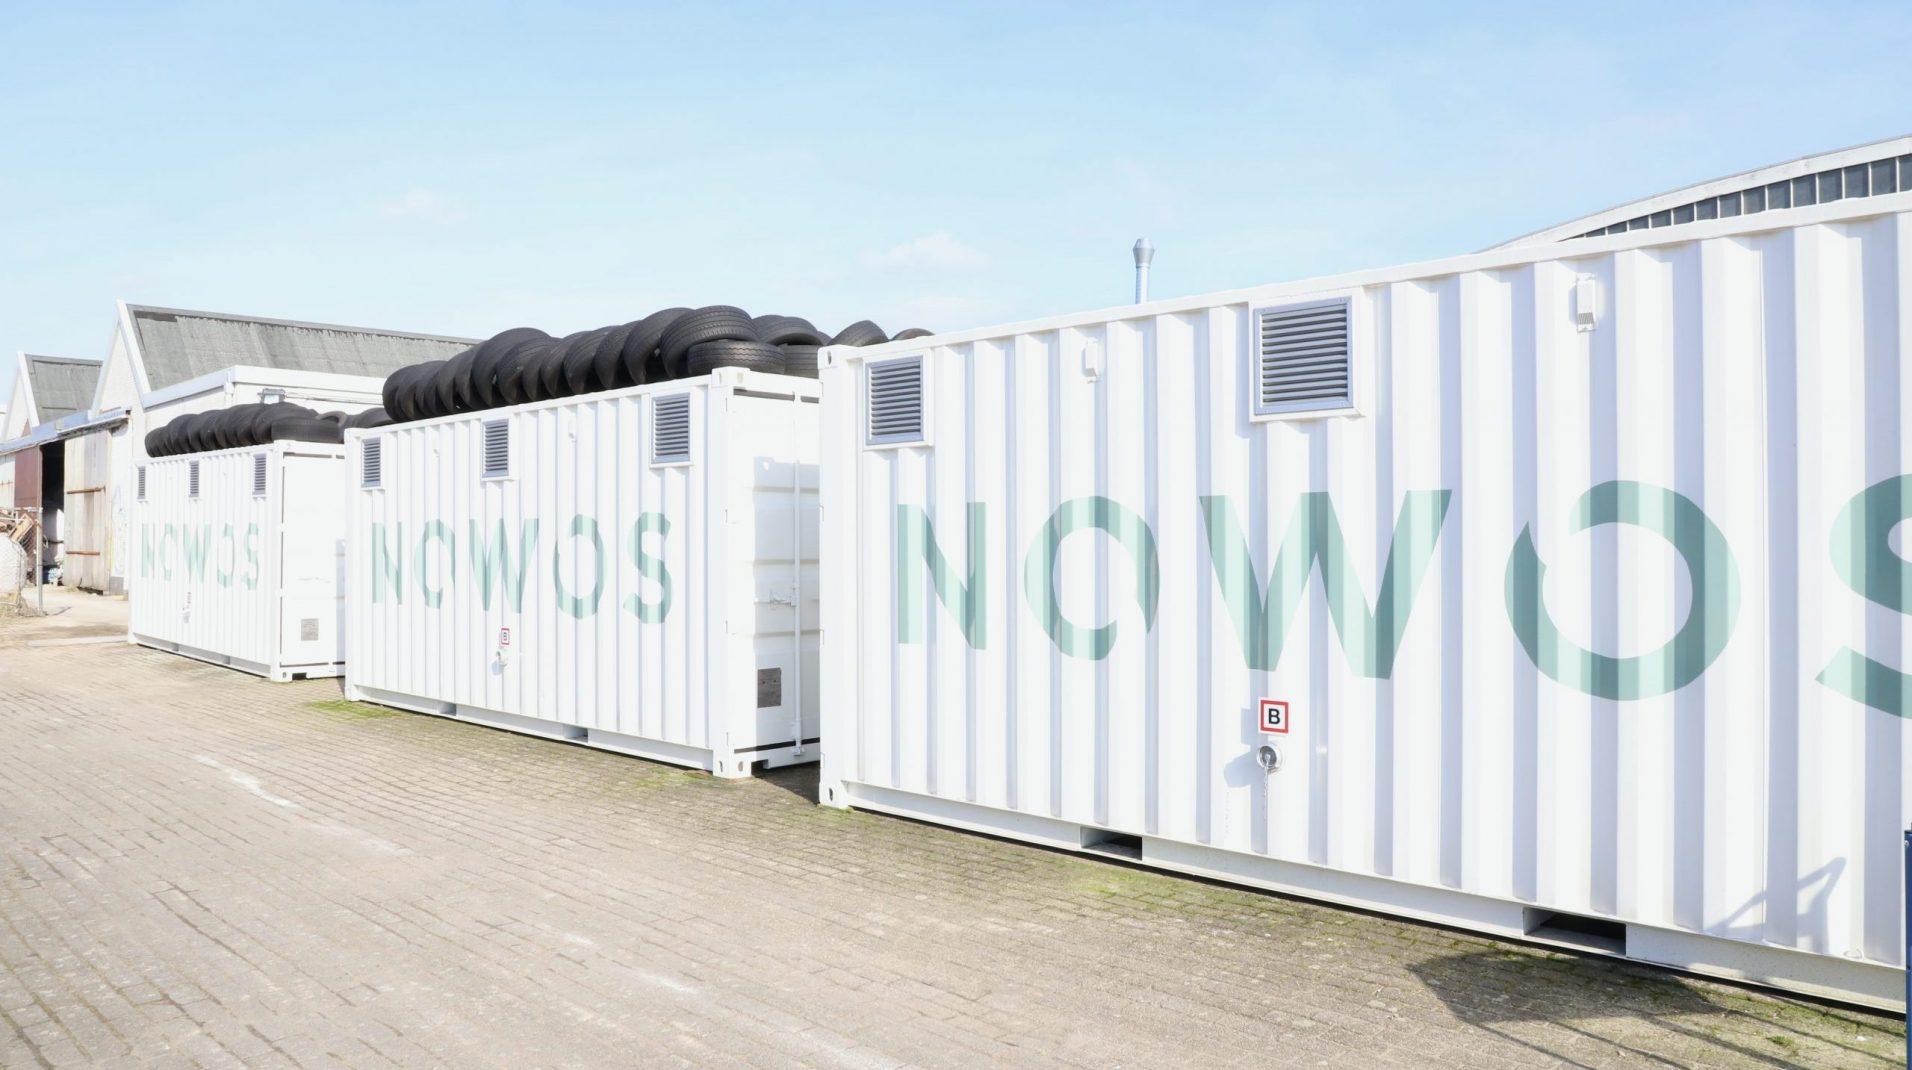 19 3 scaled e1620718868220 - Lithium Batteries Logistics